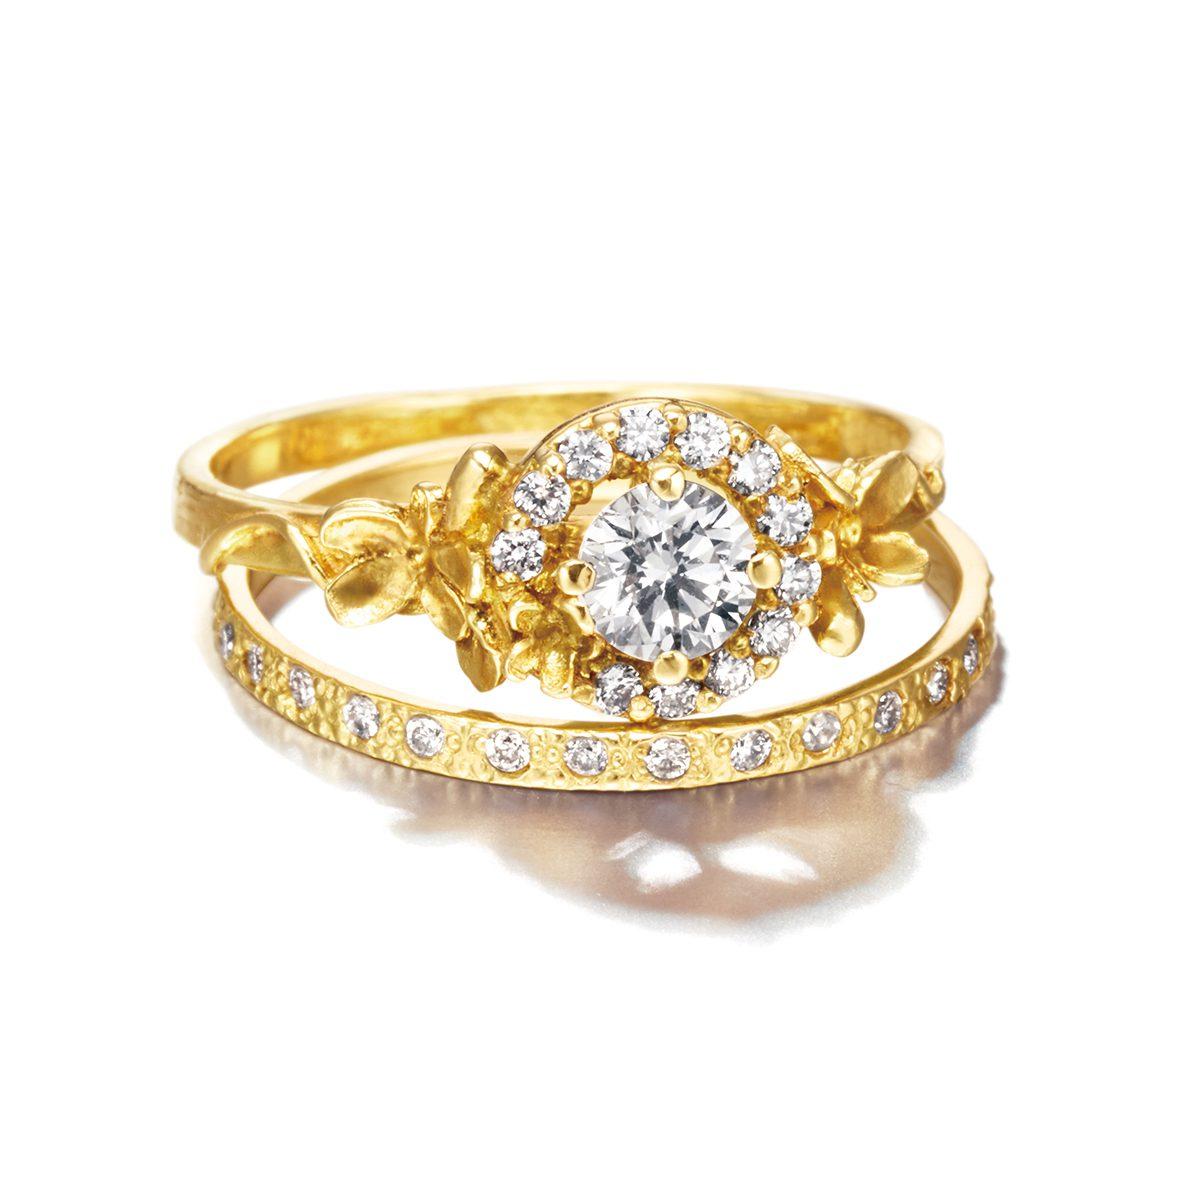 ALEX MONROE Spring Halo ring / Spring Eternity|Engagement Rings